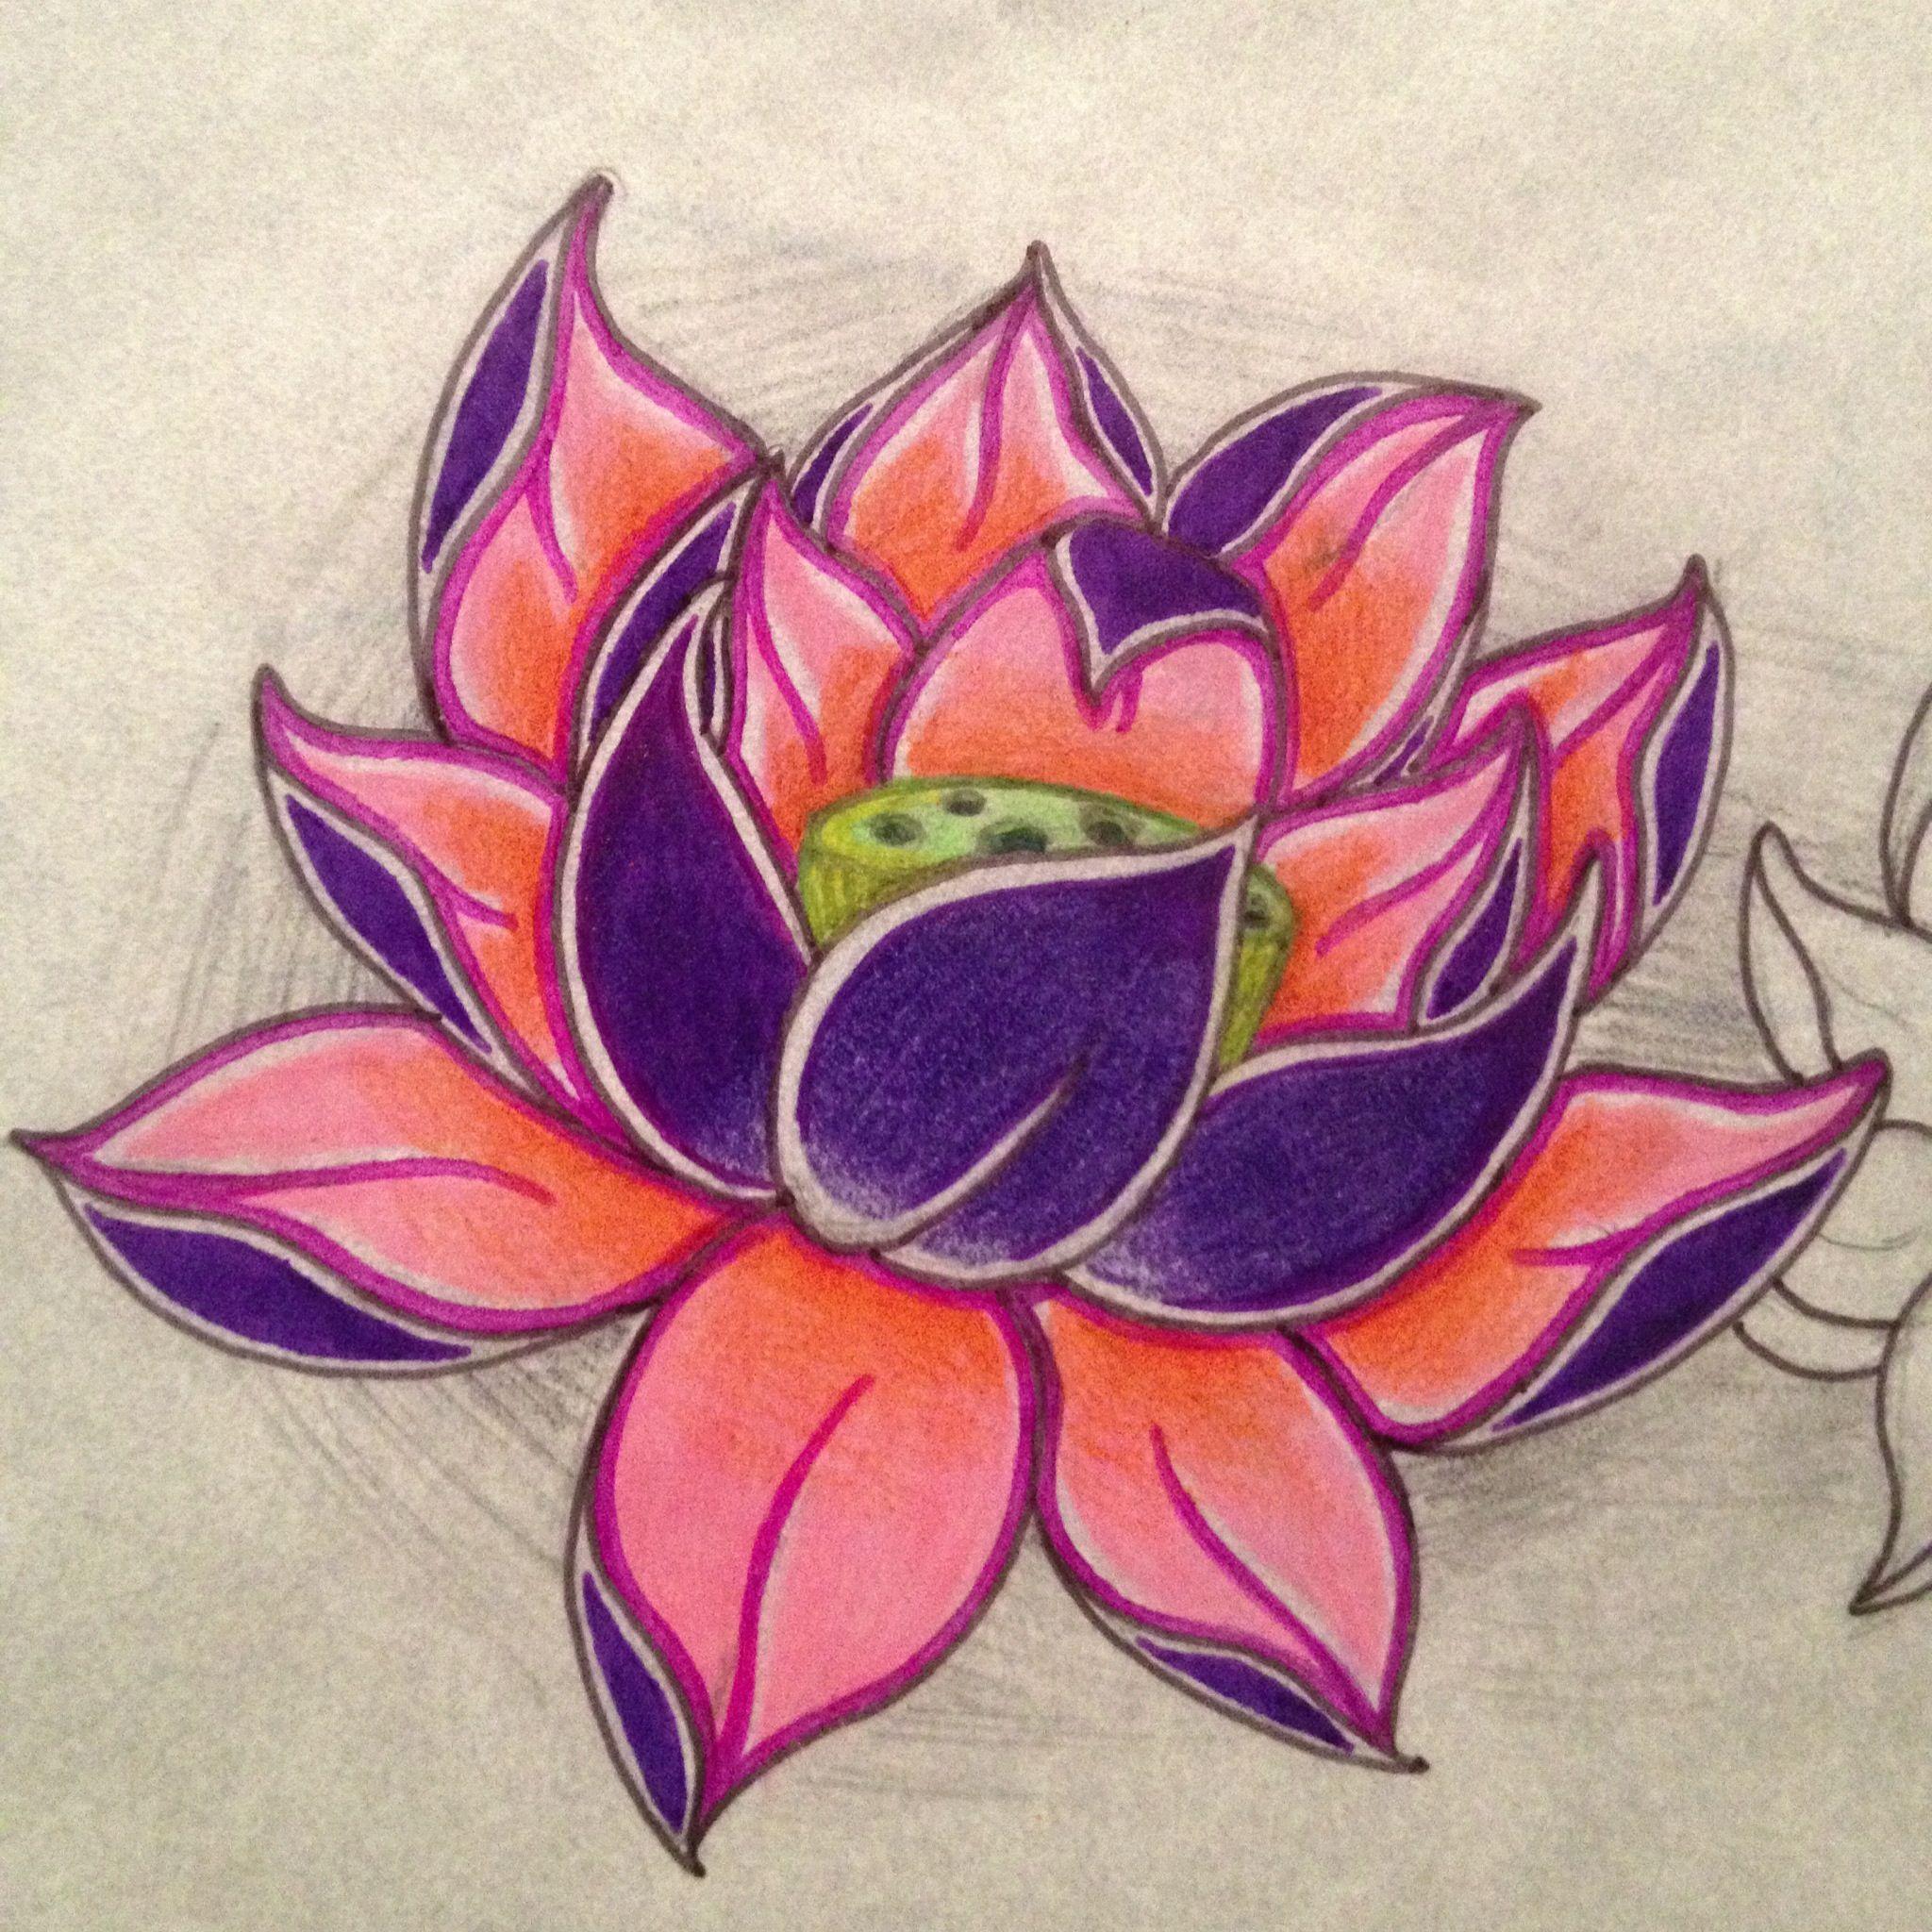 Sharpie Drawings Of Flowers | www.imgkid.com - The Image ... Sharpie Art Flowers